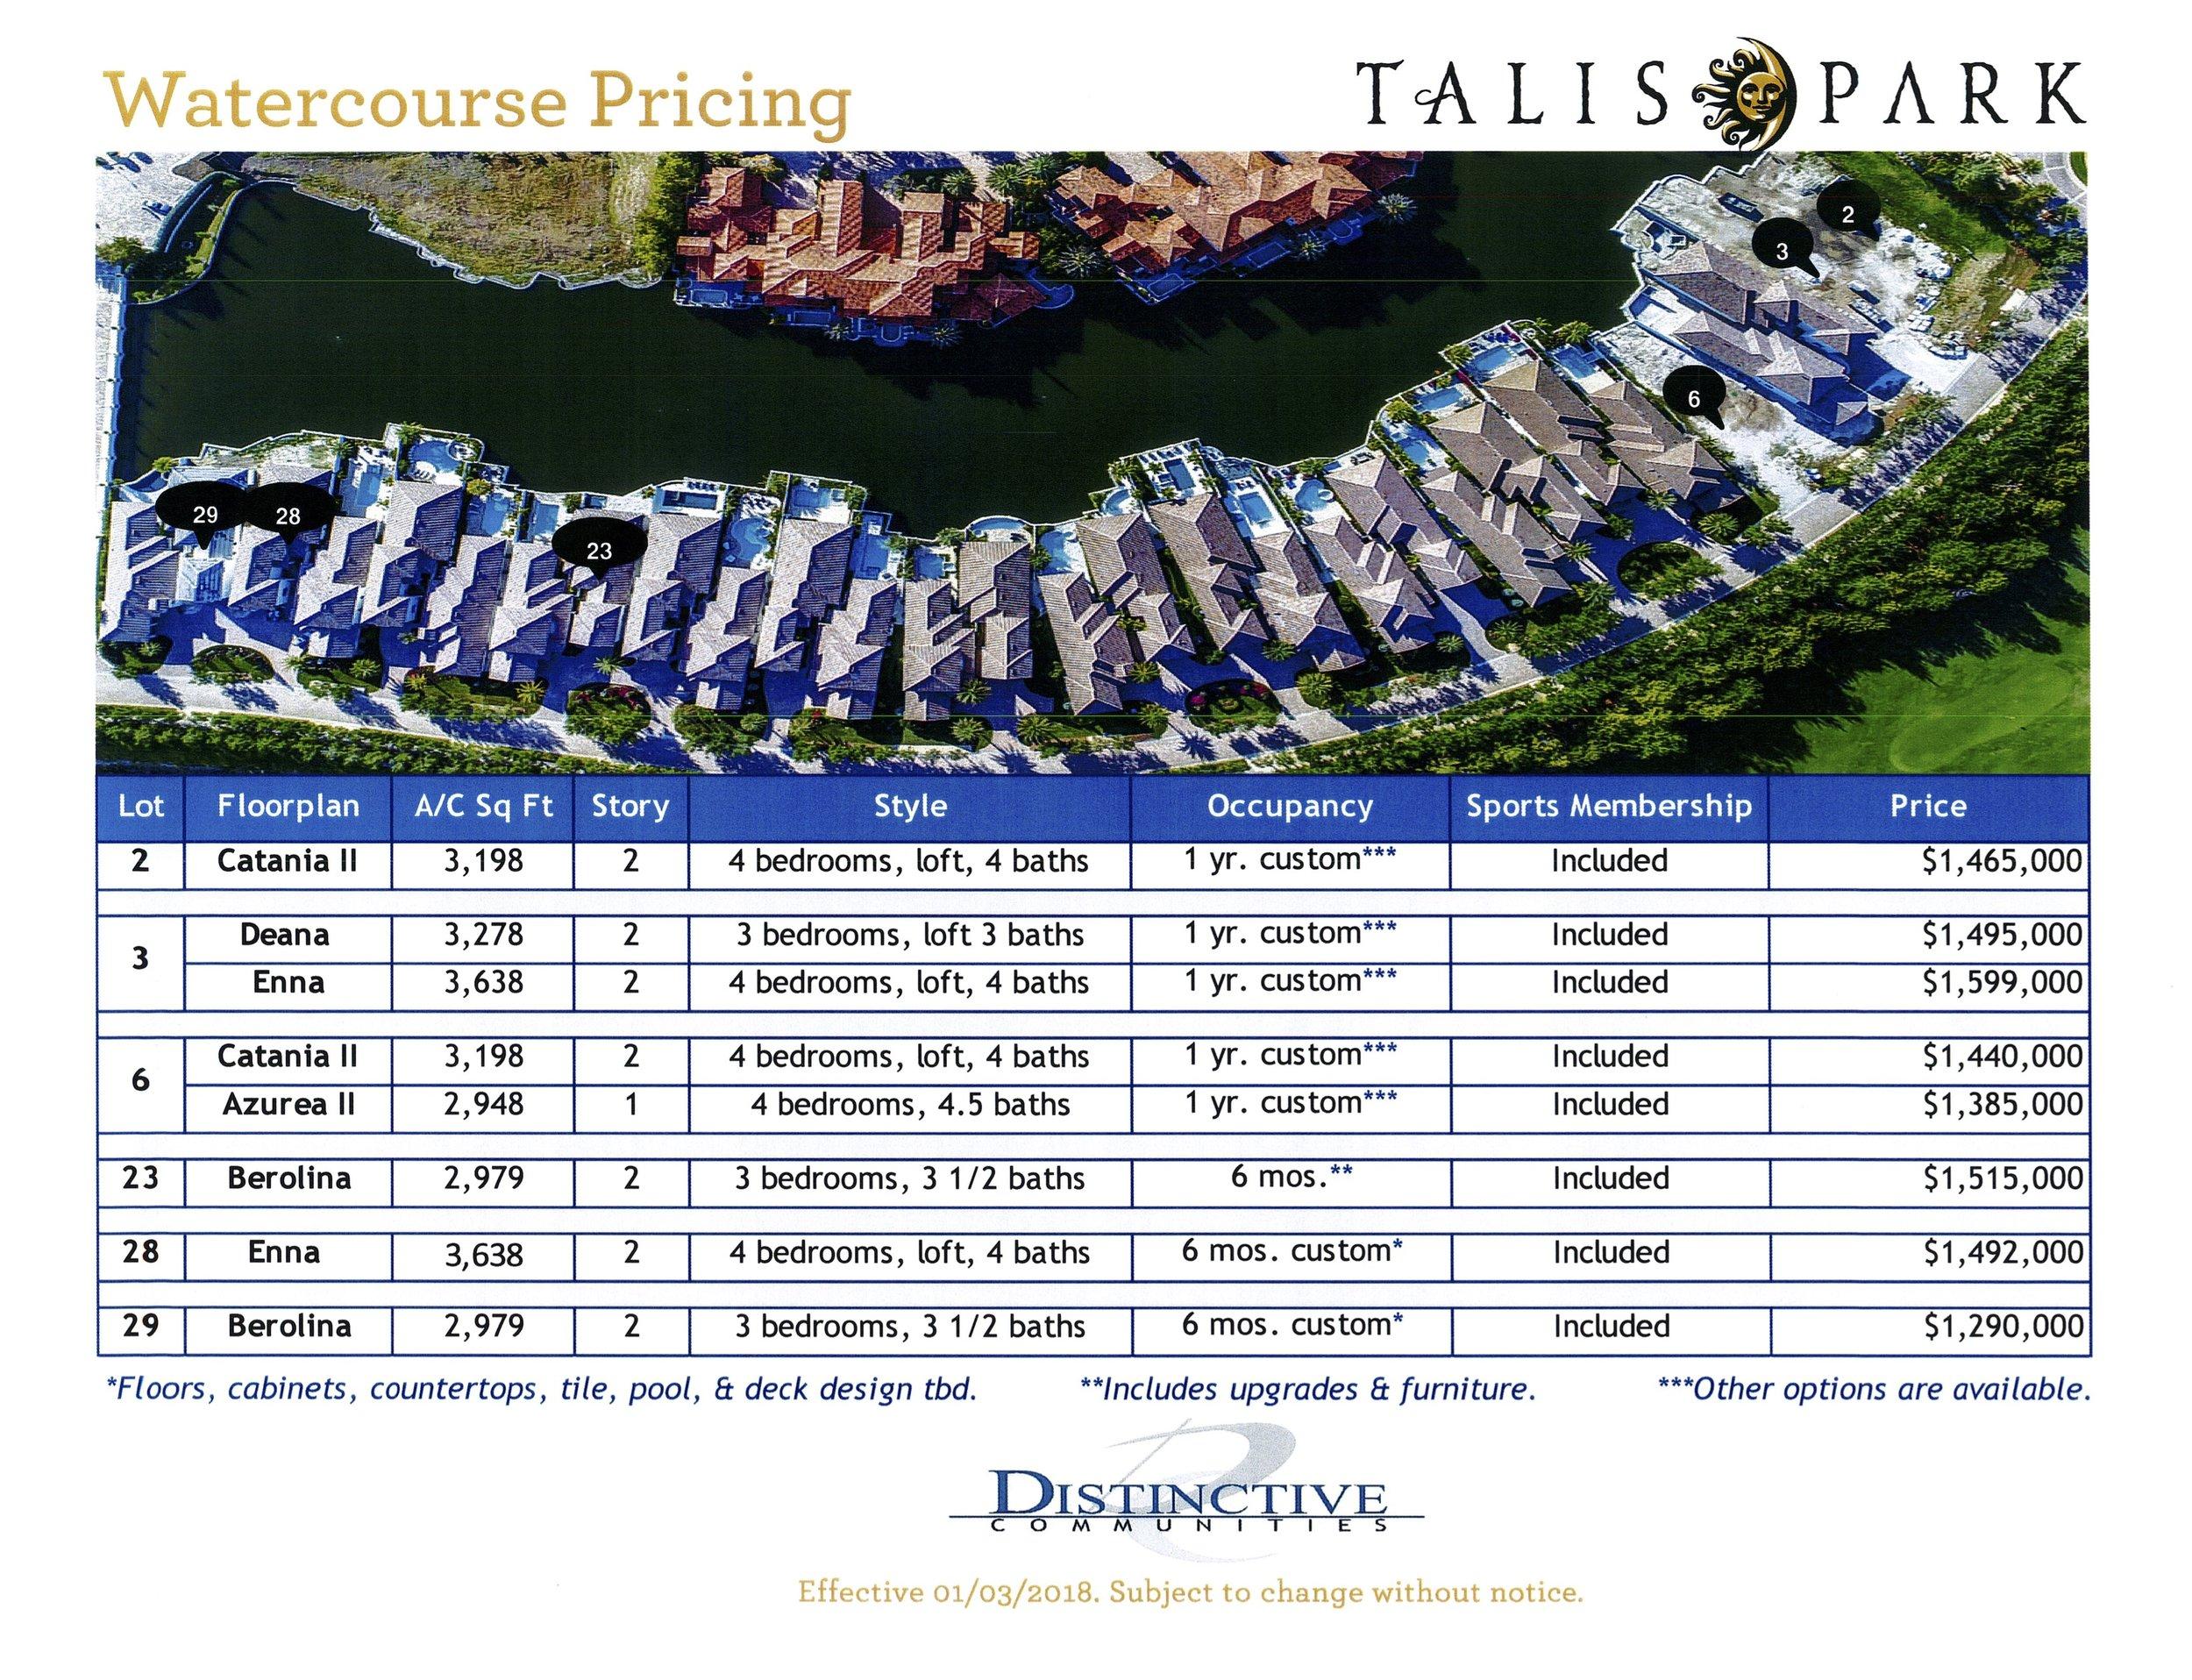 Watercourse price sheet w-fees - 01-03-2018.jpg